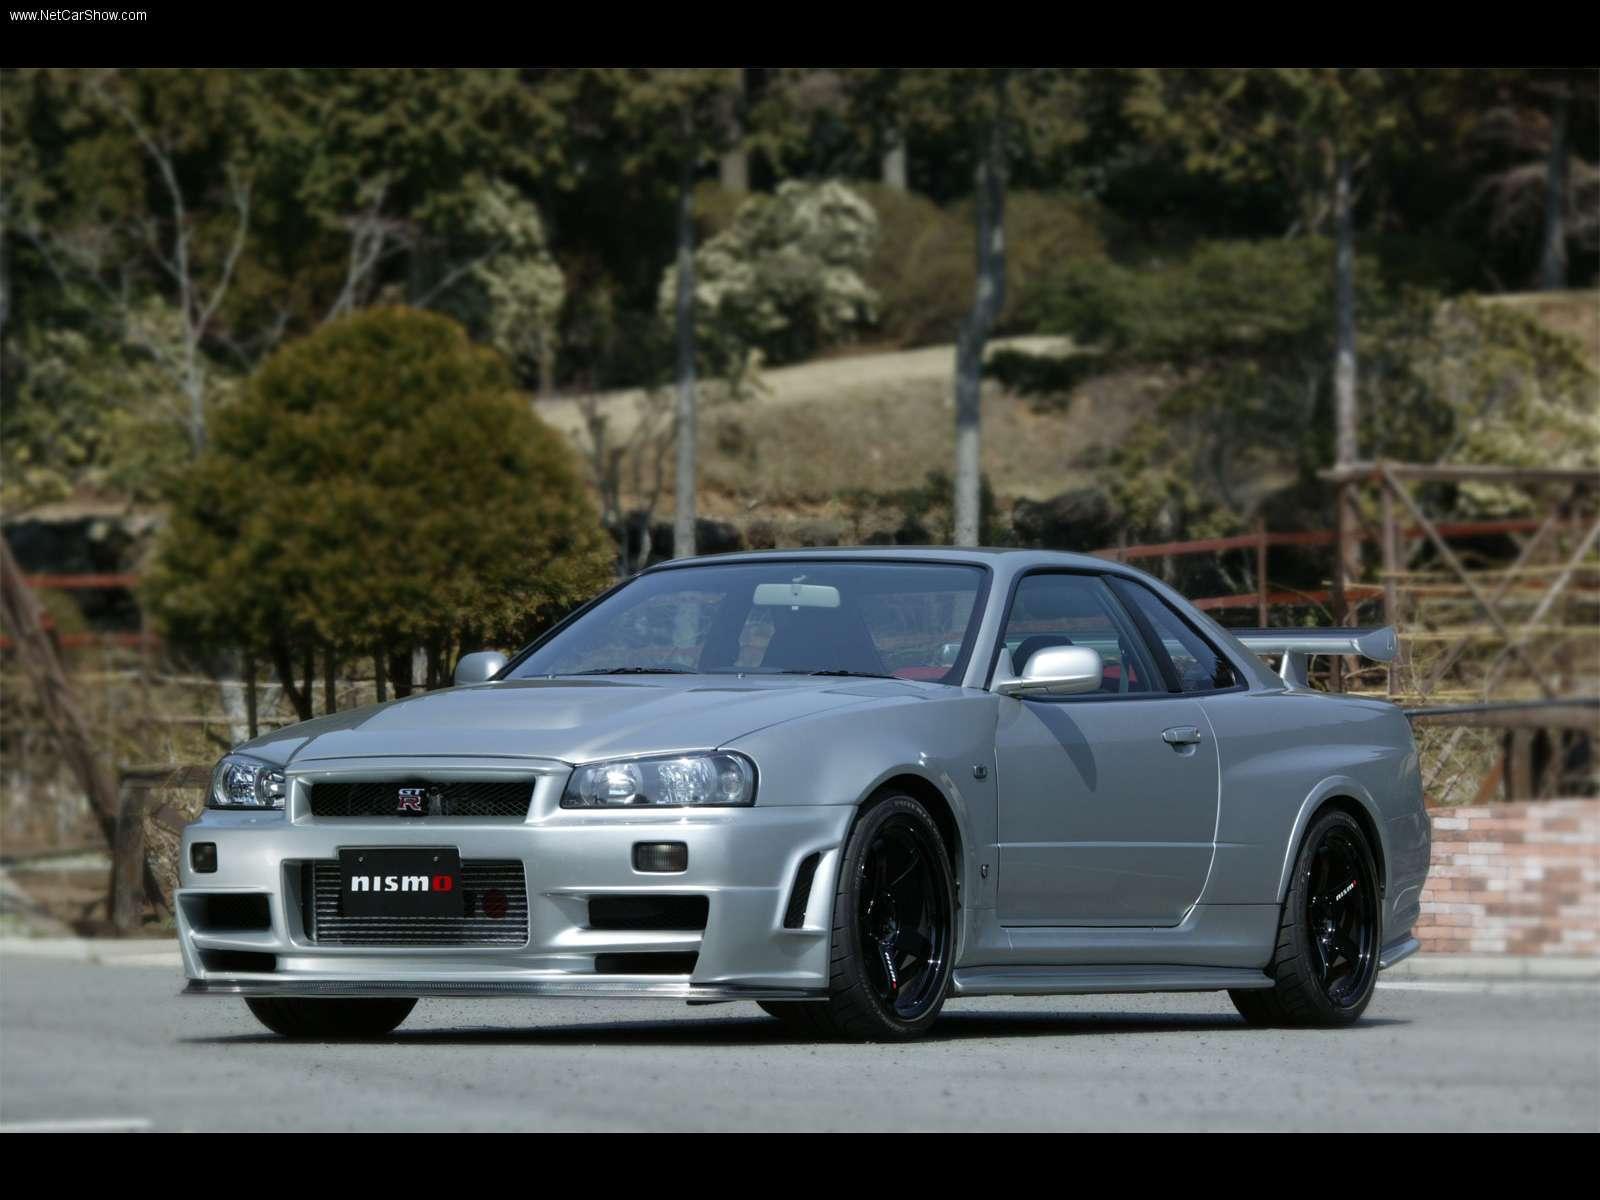 Nismo-Nissan_Skyline_R34_GTR_Z_Tune_2005_1600x1200_wallpaper_07.jpg